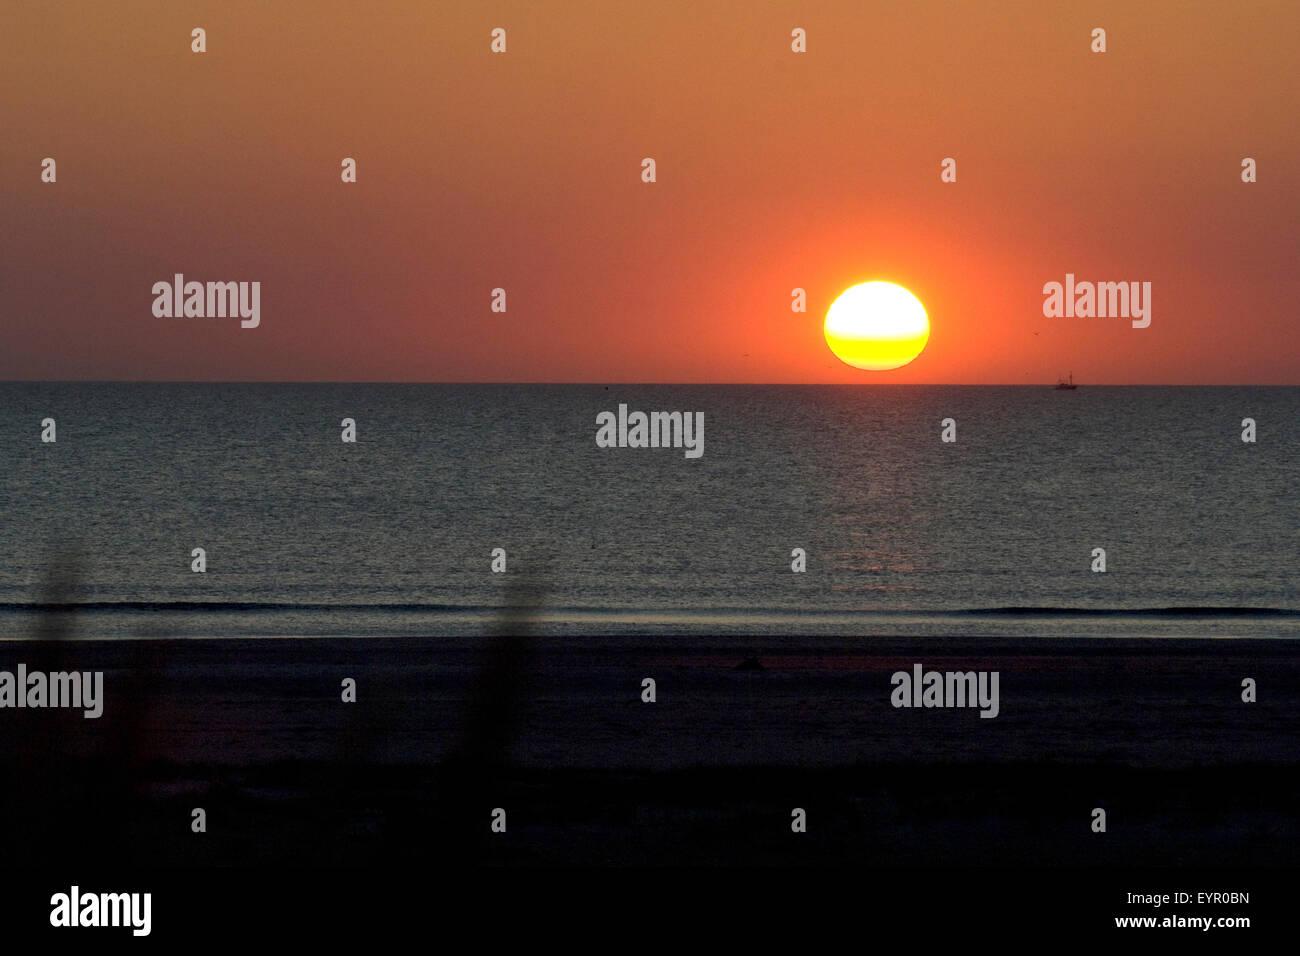 Sonnenuntergang, Abendrot, Abend; - Stock Image